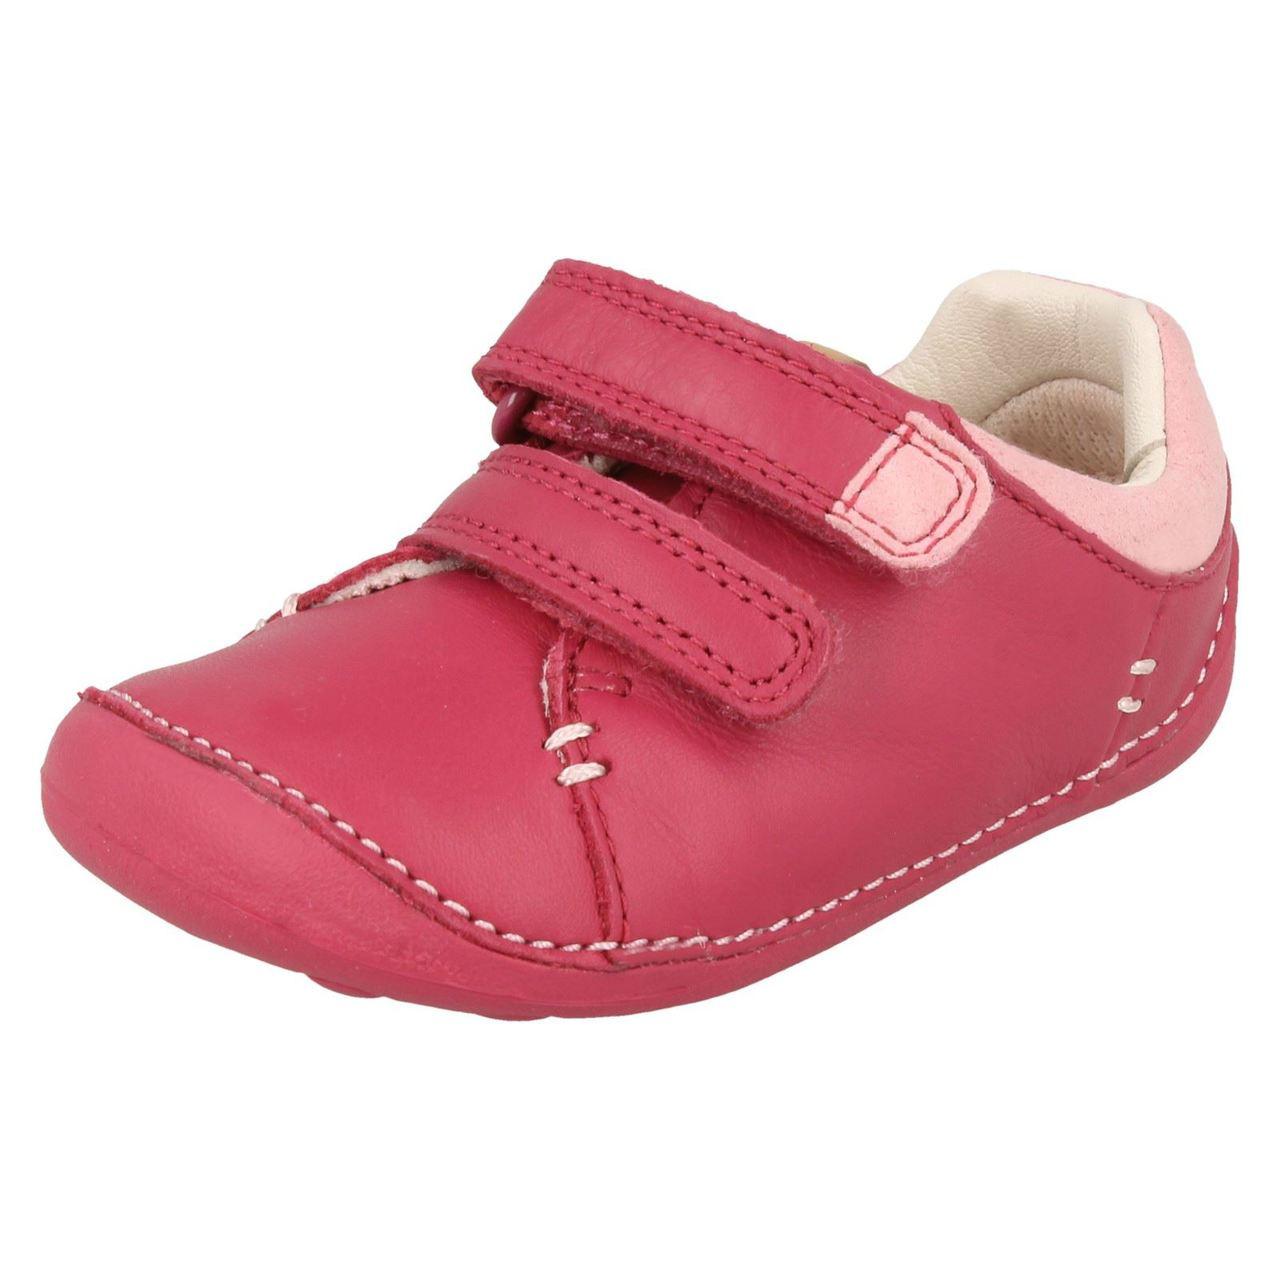 Clarks Casual Shoes Little Hen